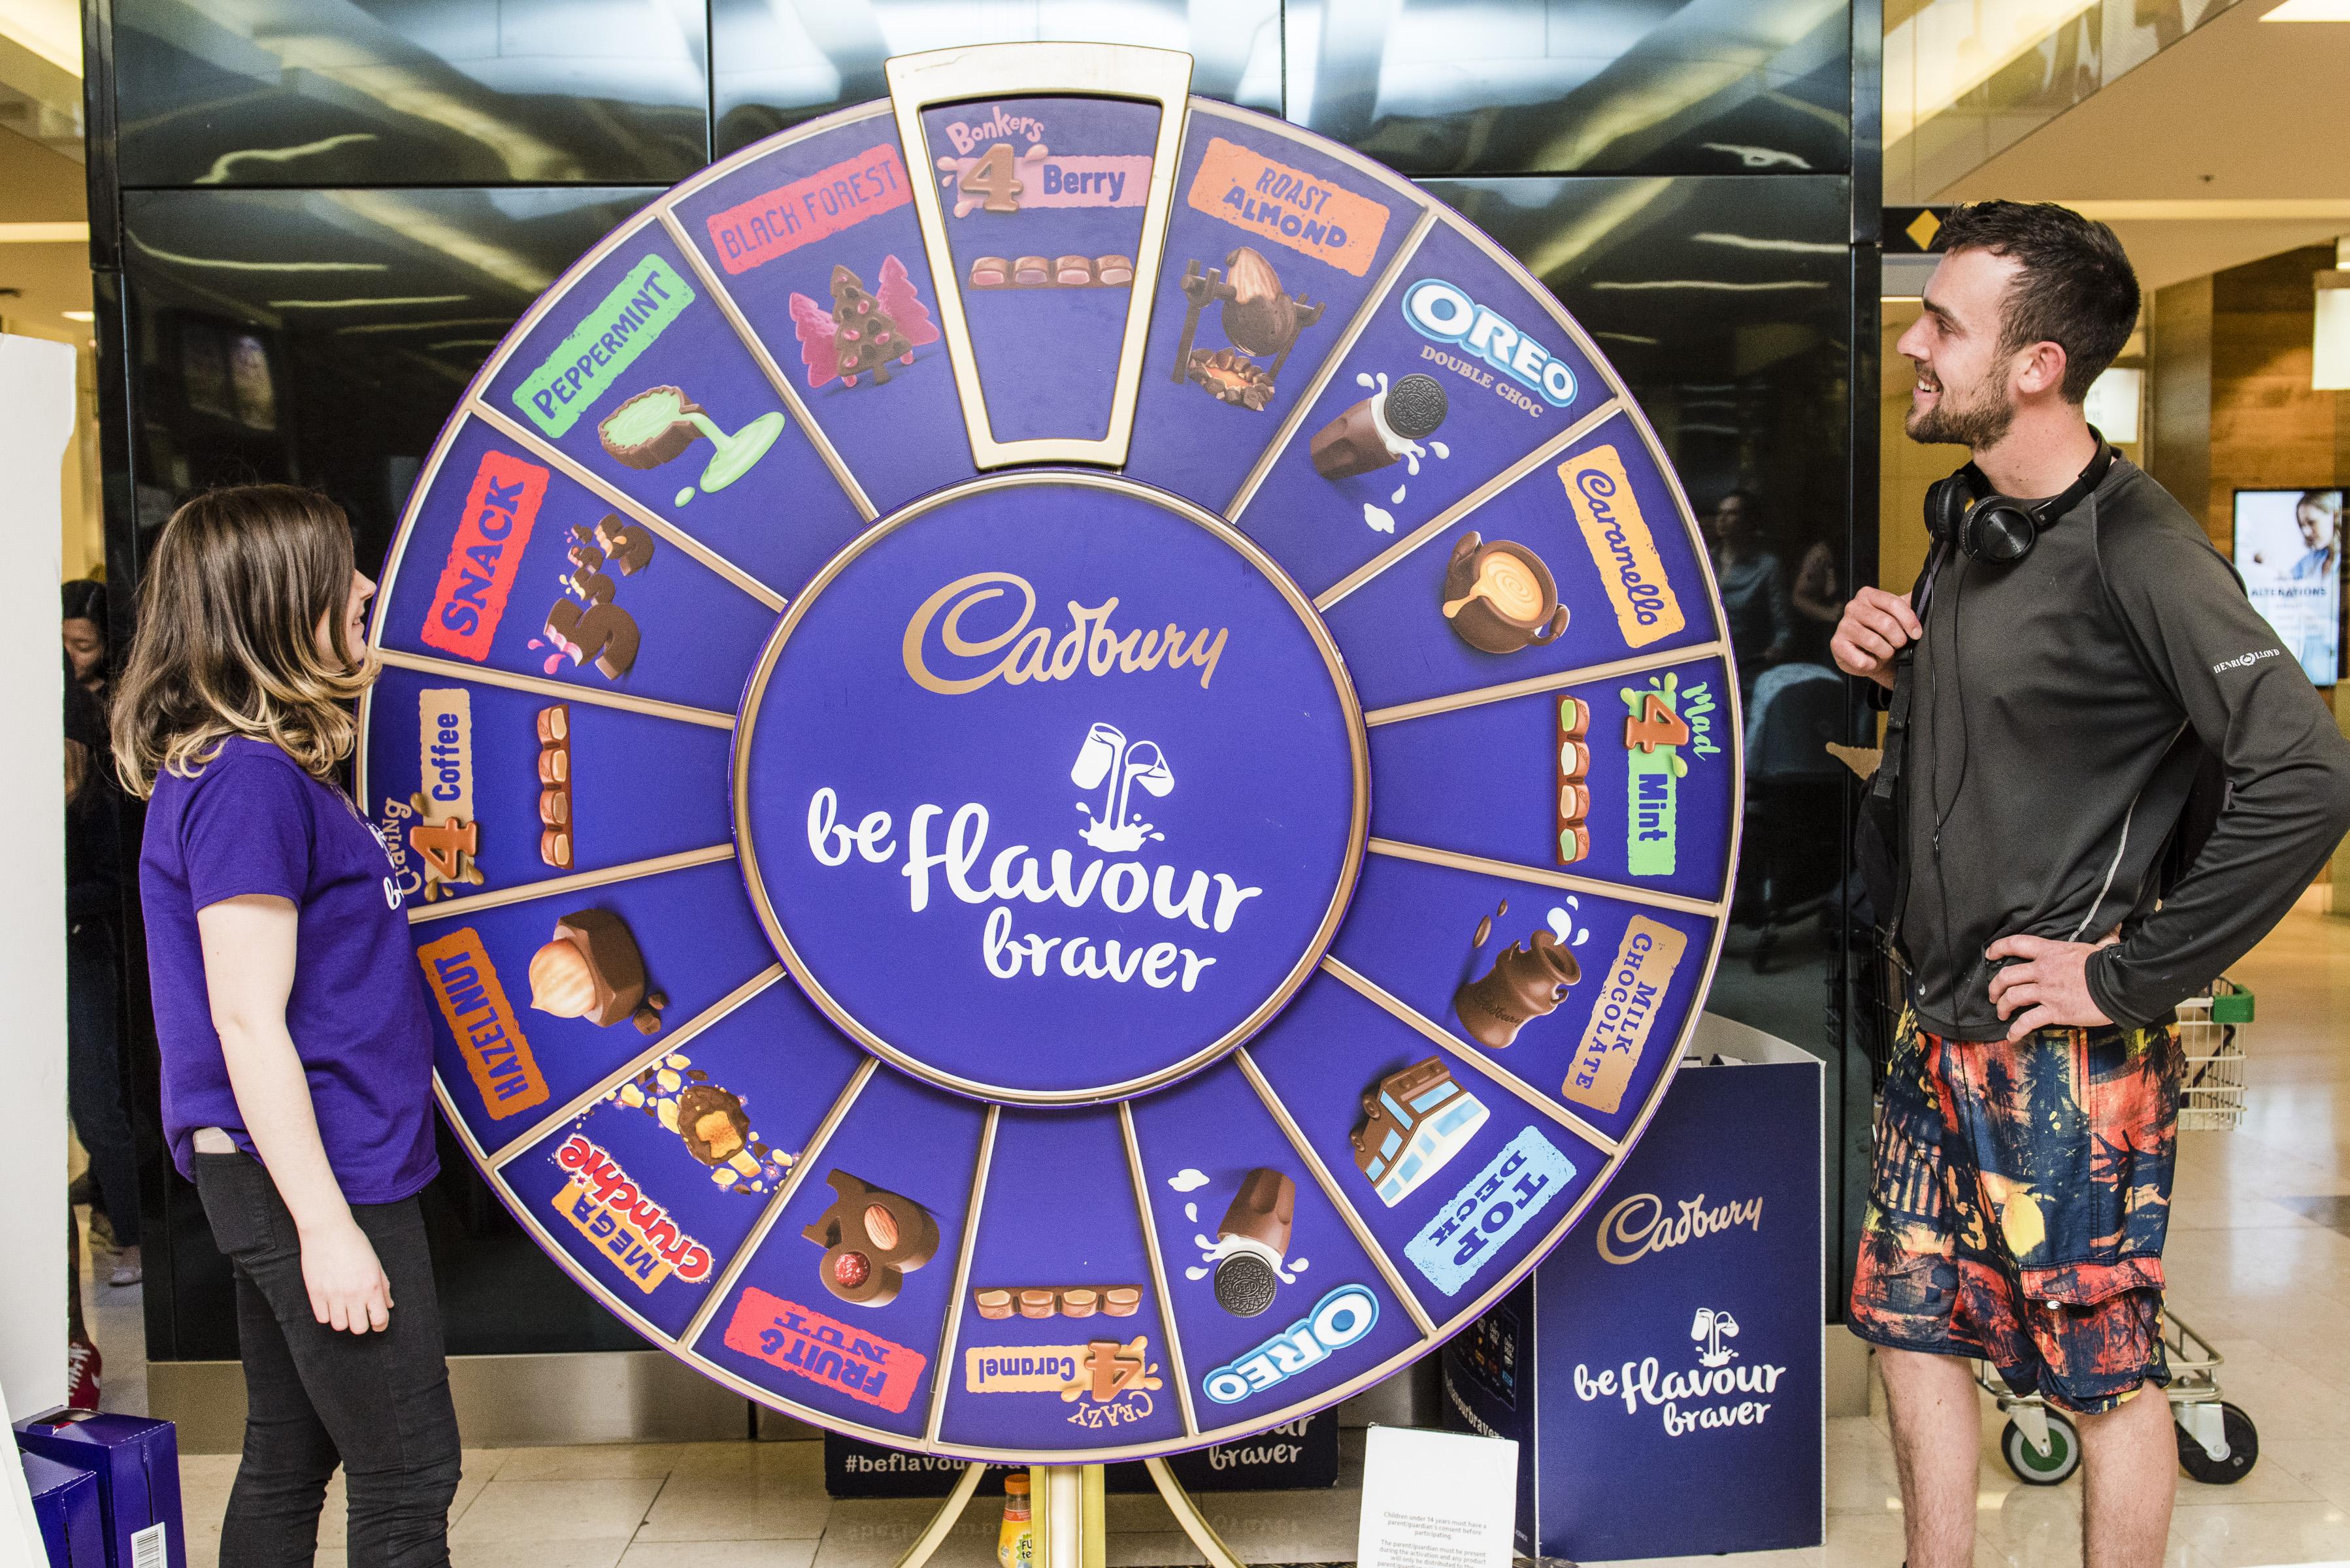 Cadbury Flavour Braver Roadshow